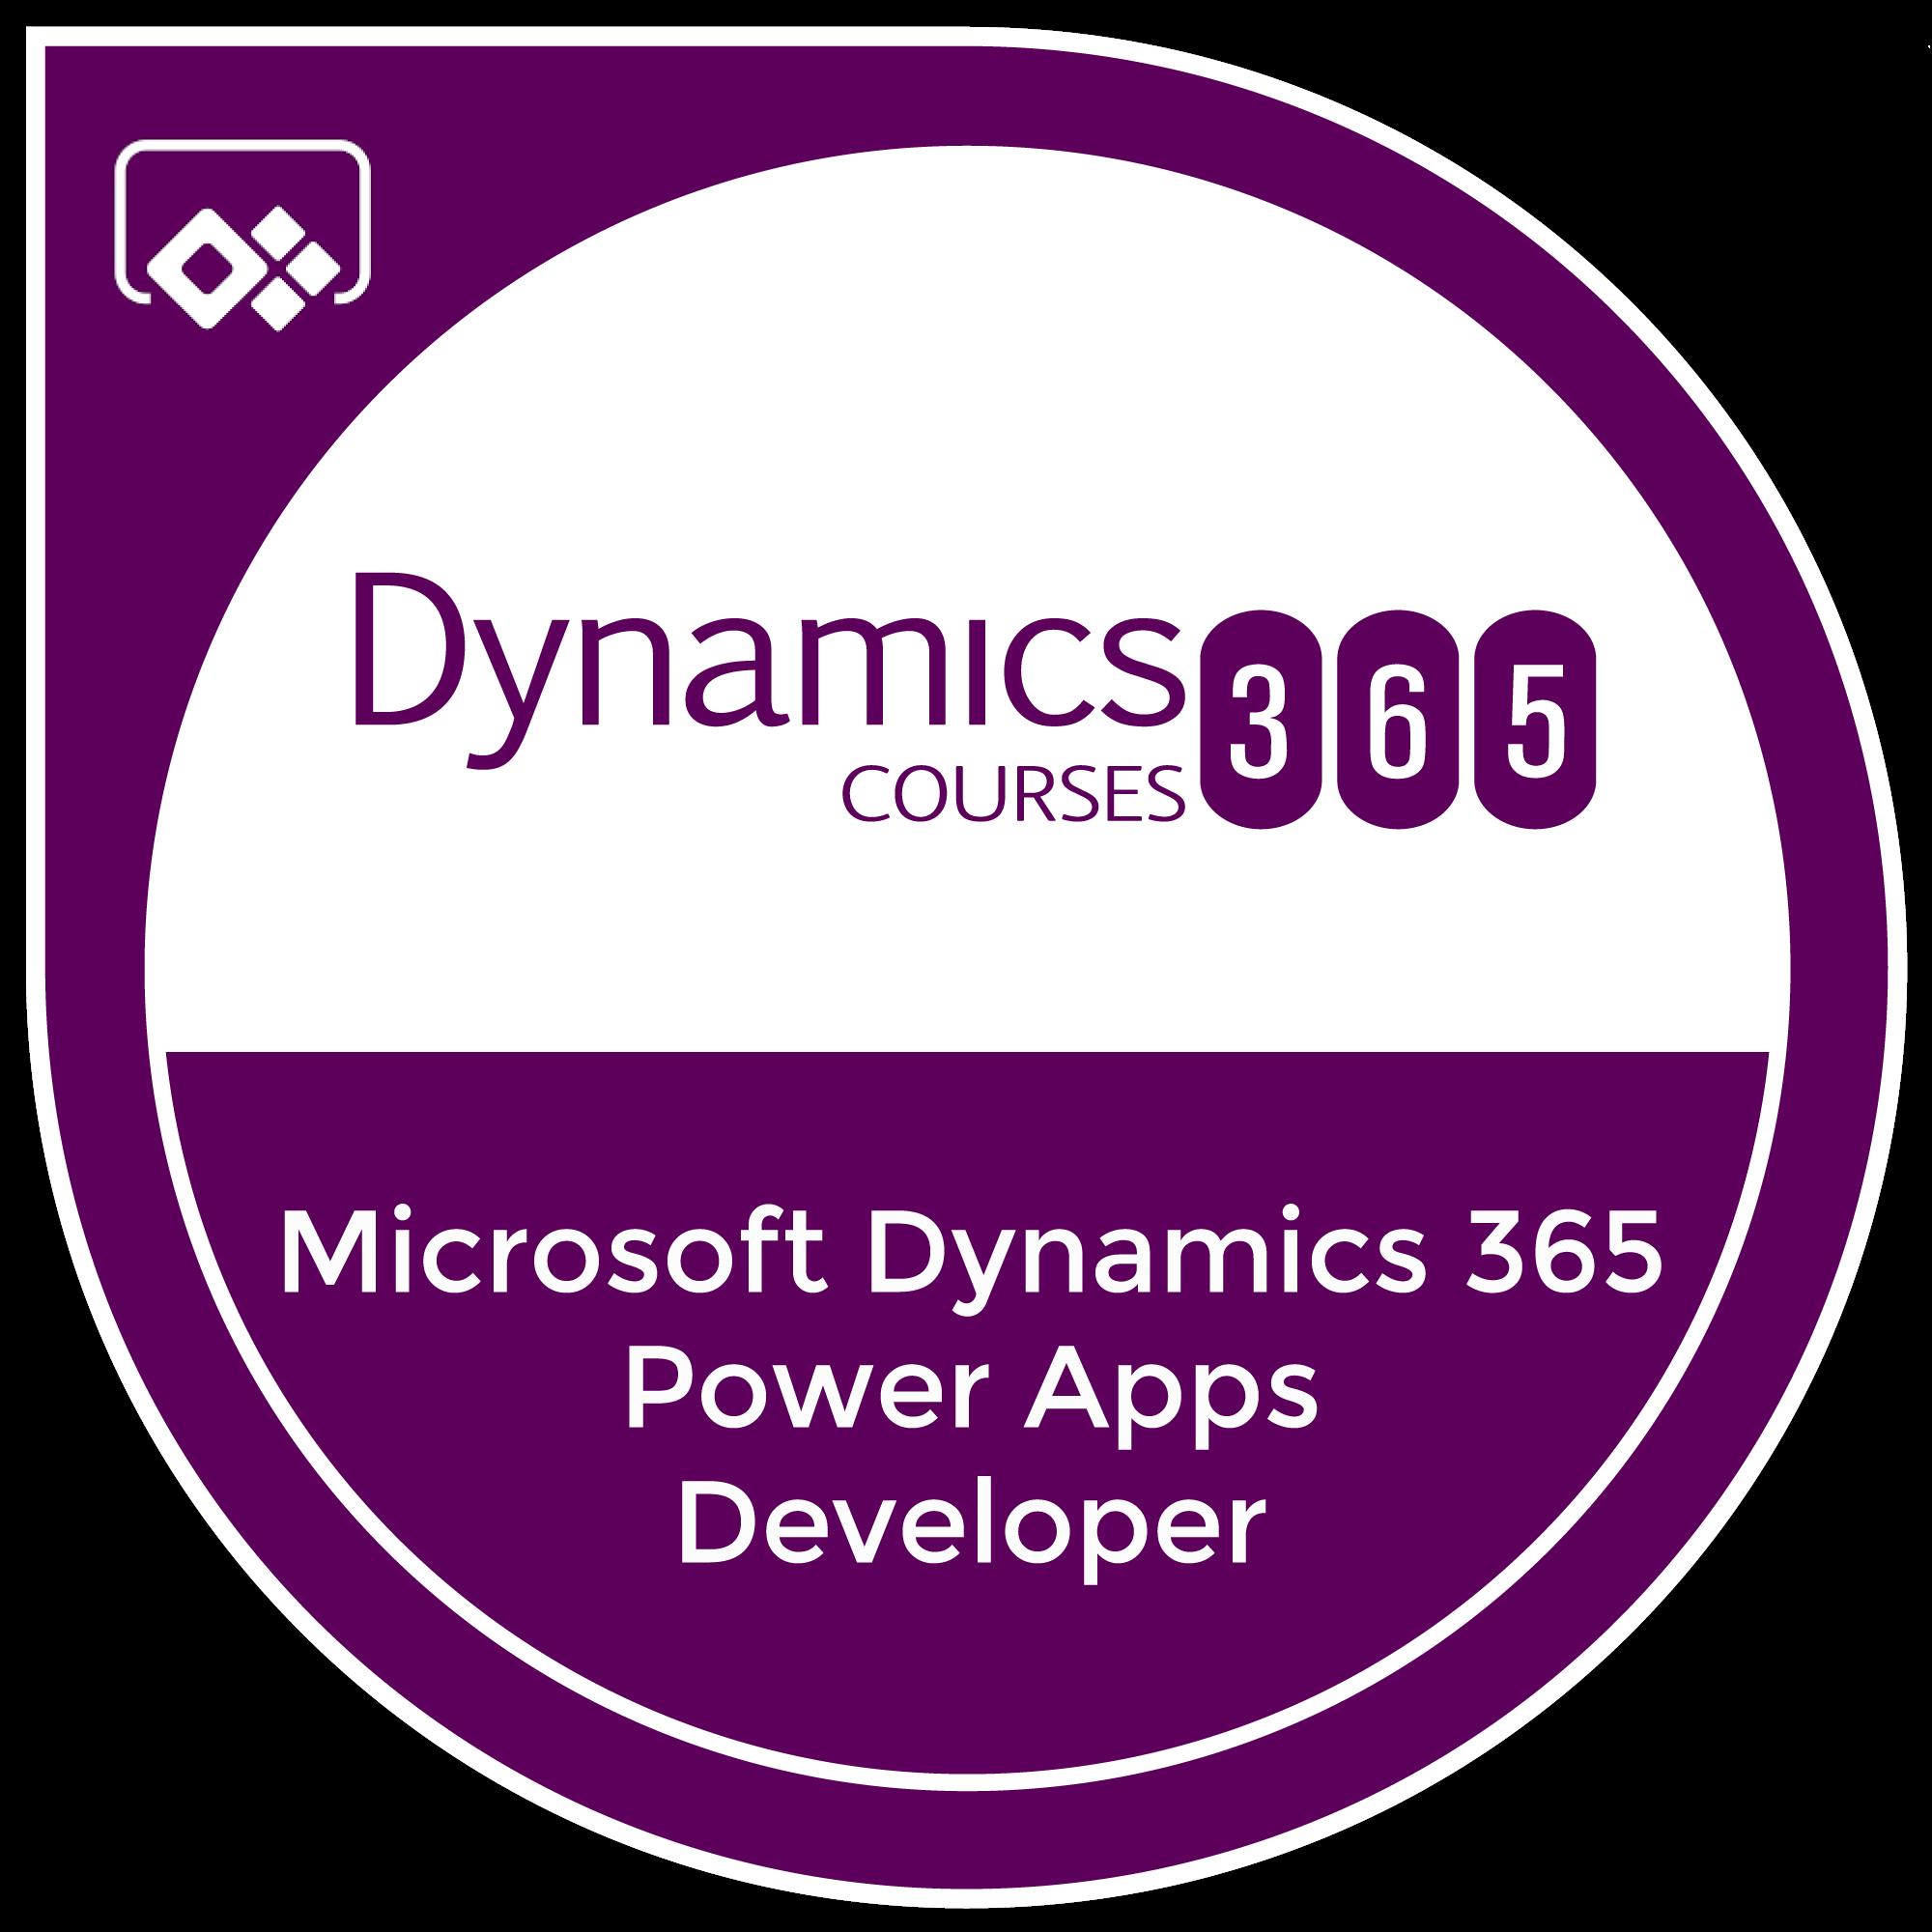 Microsoft Dynamics 365 Power Apps Developer